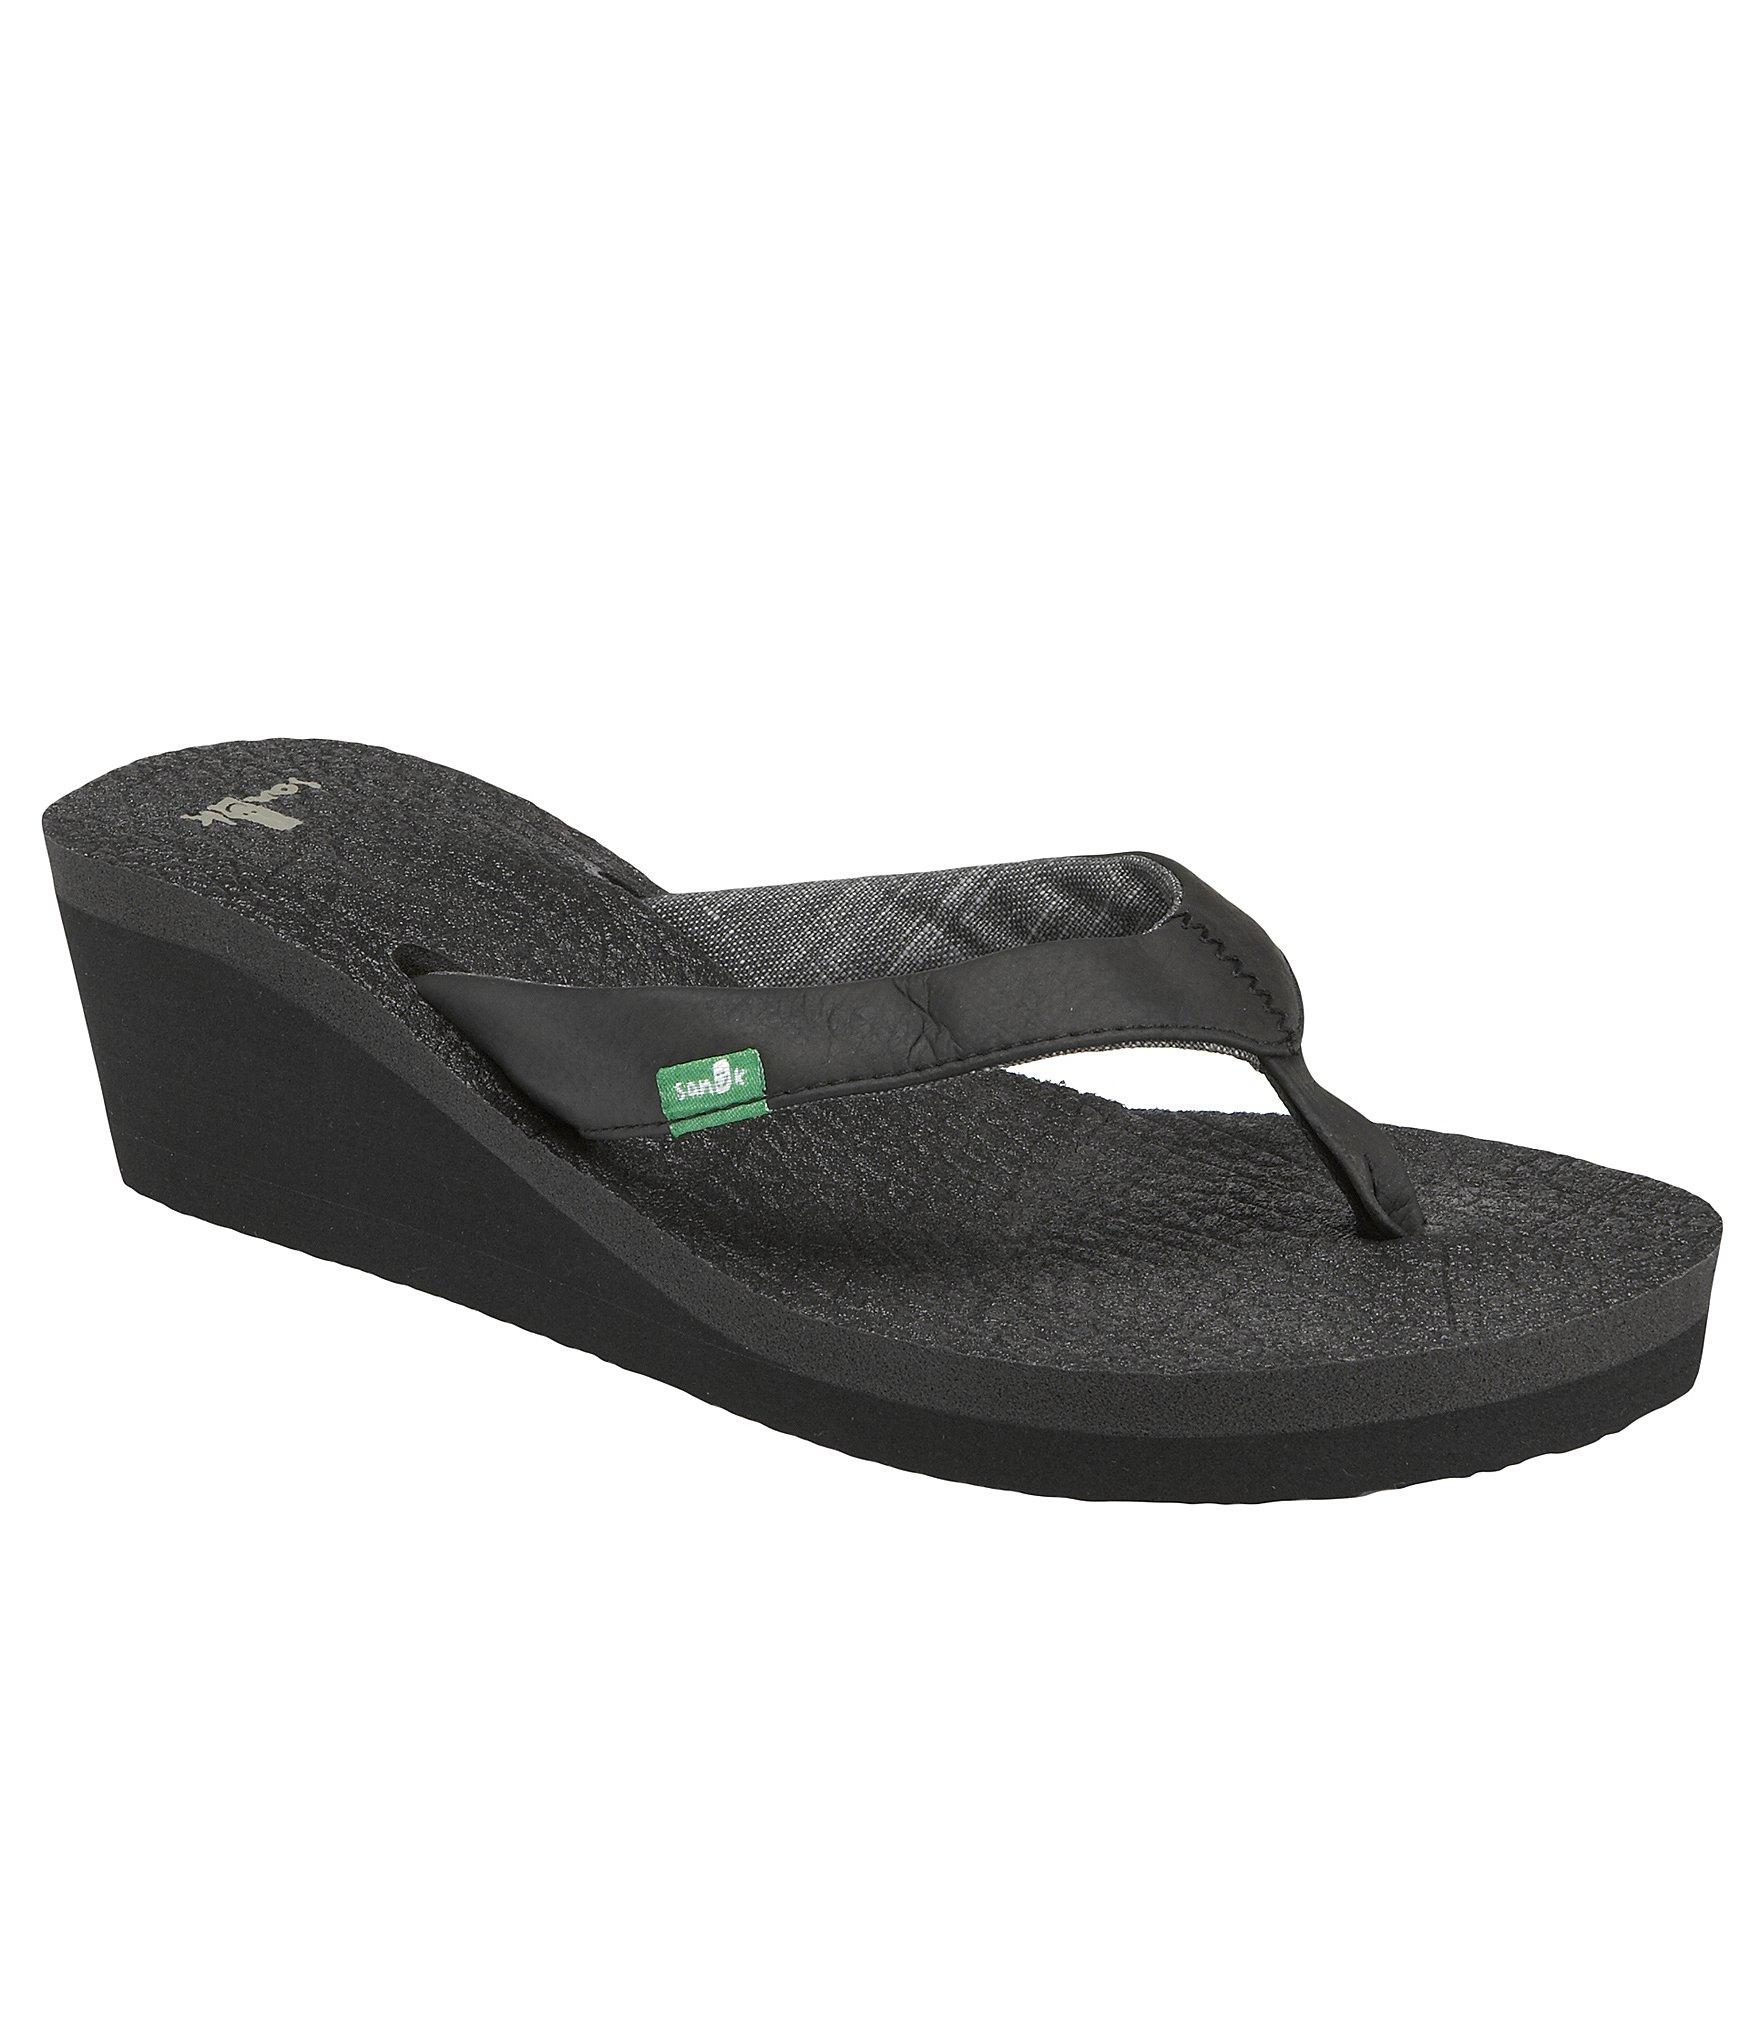 Sanuk Yoga Mat Wedge Sandals In Black